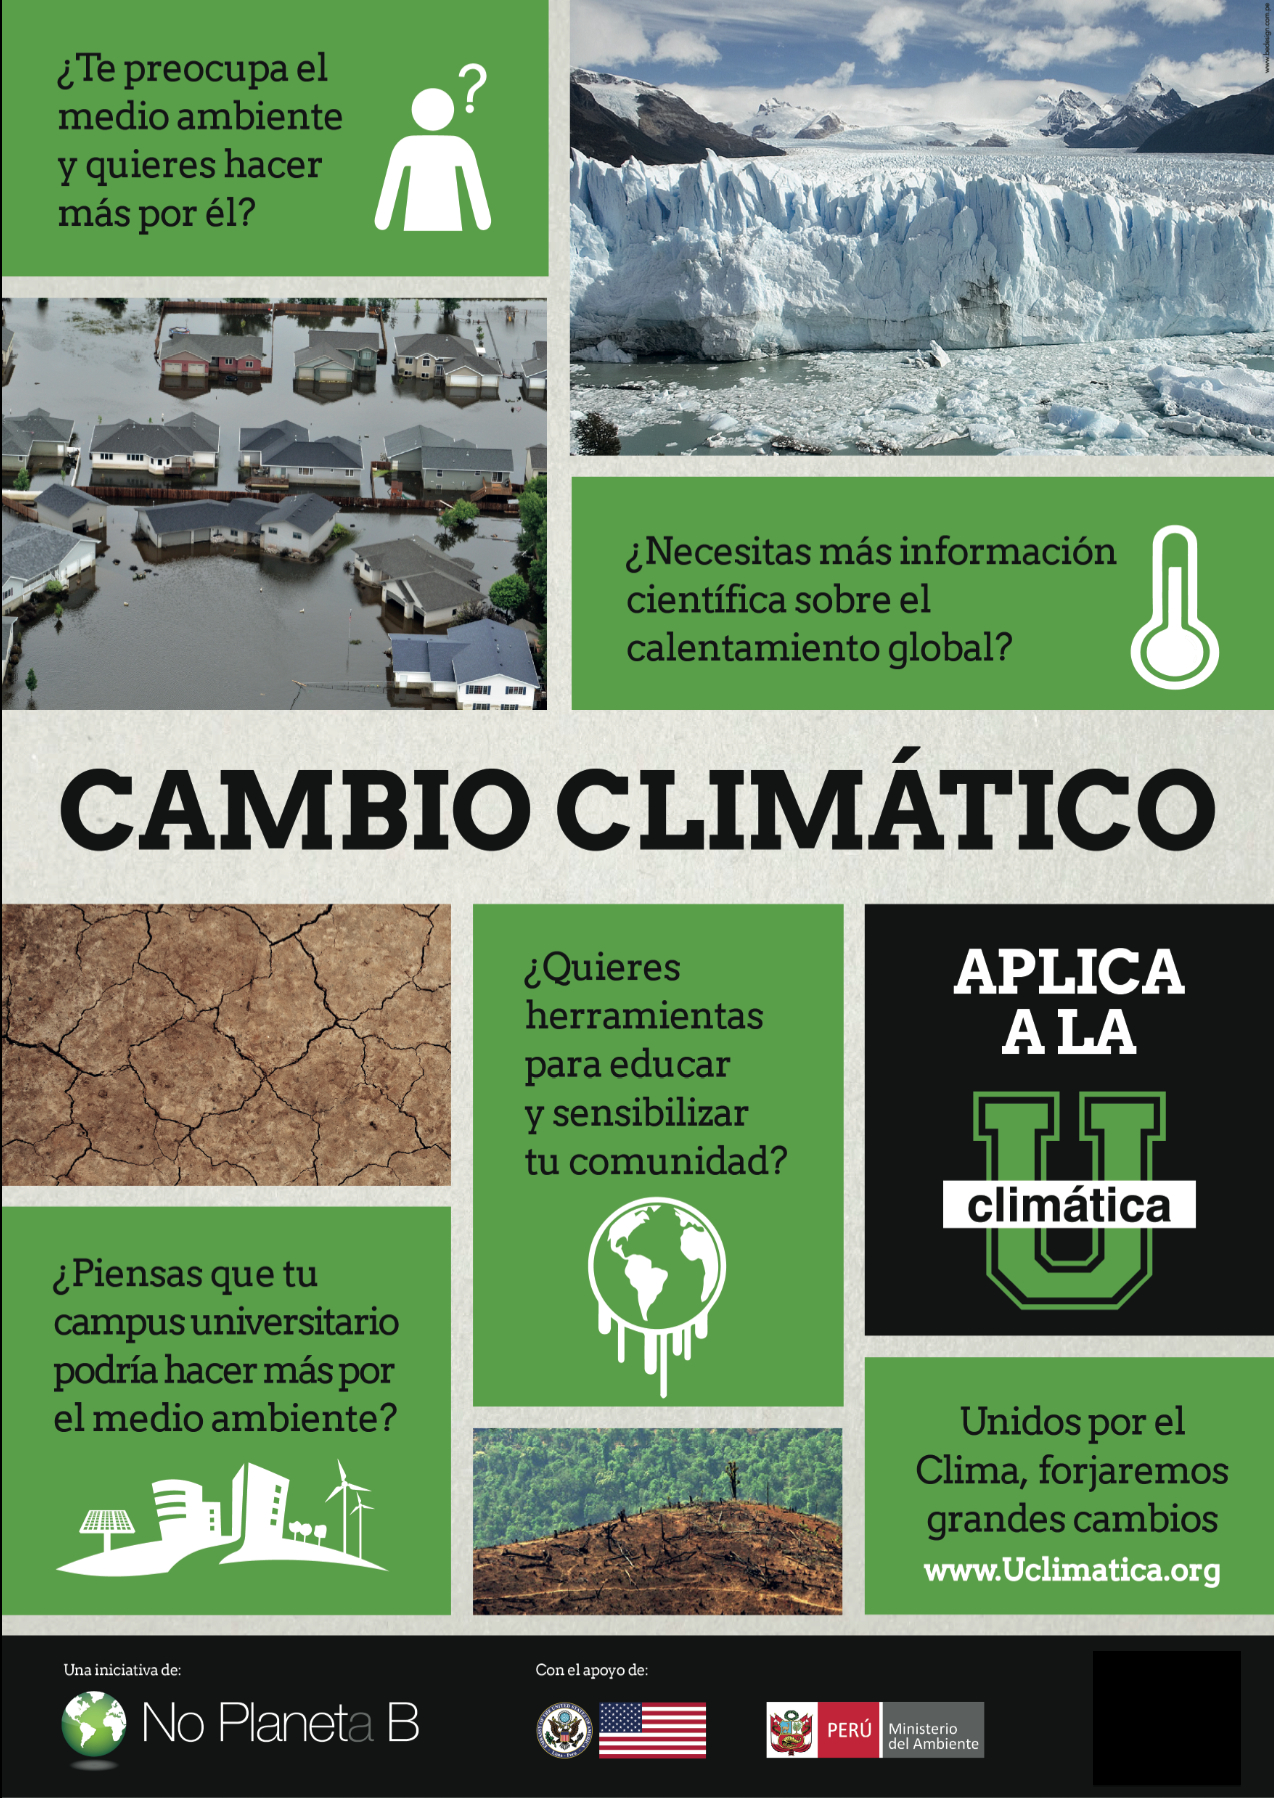 UCLIMATICA FB poster copy